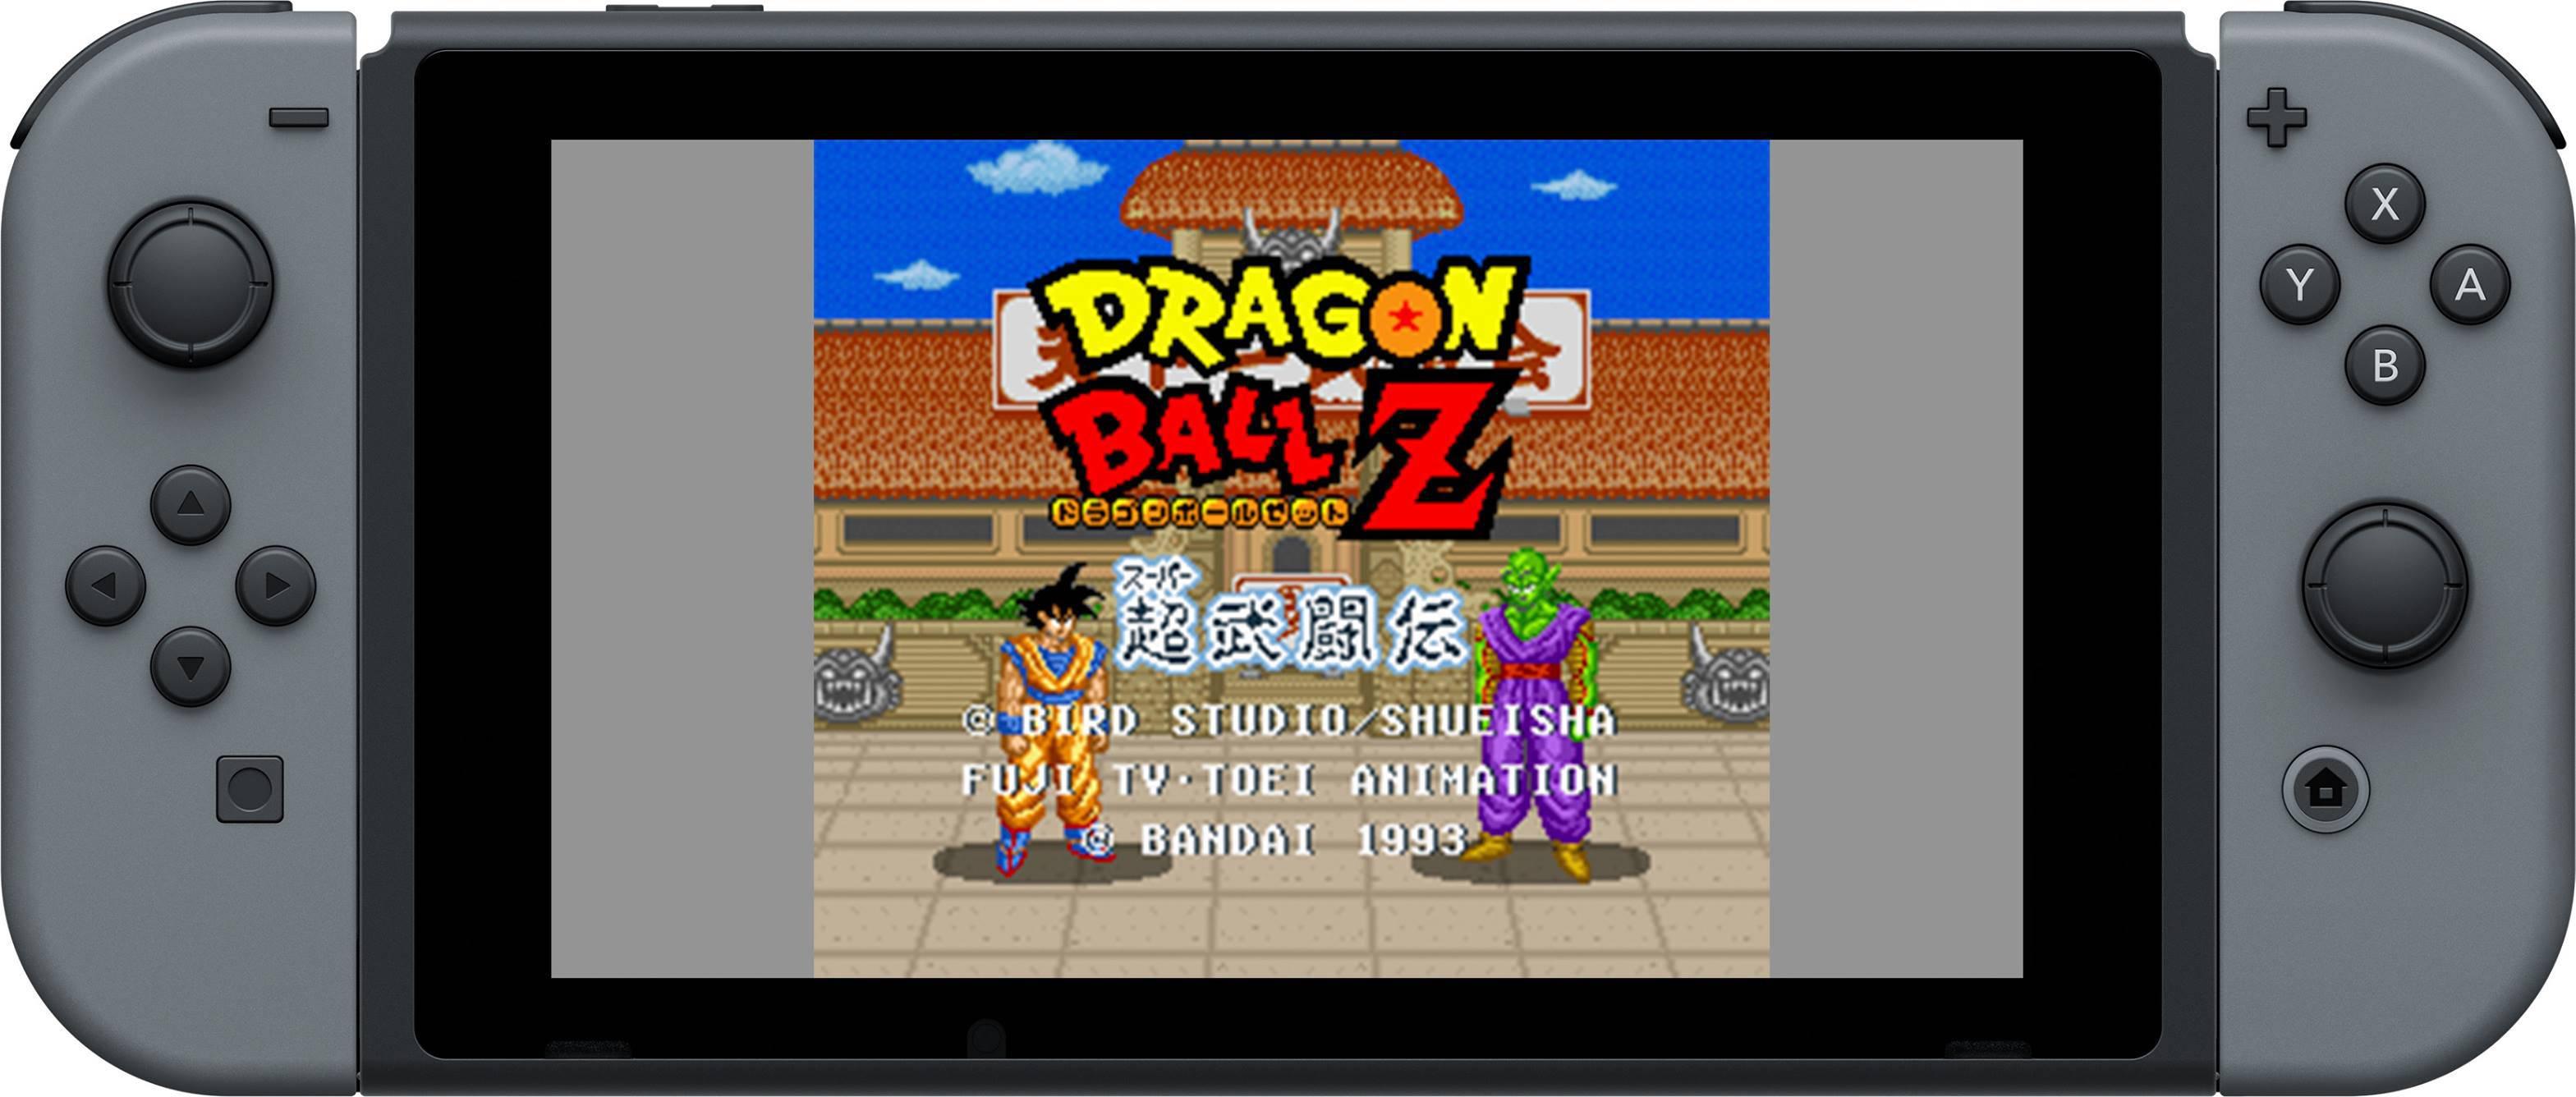 DRAGON BALL FighterZ και Xenoverse 2 NEWS - Geekdom News 13